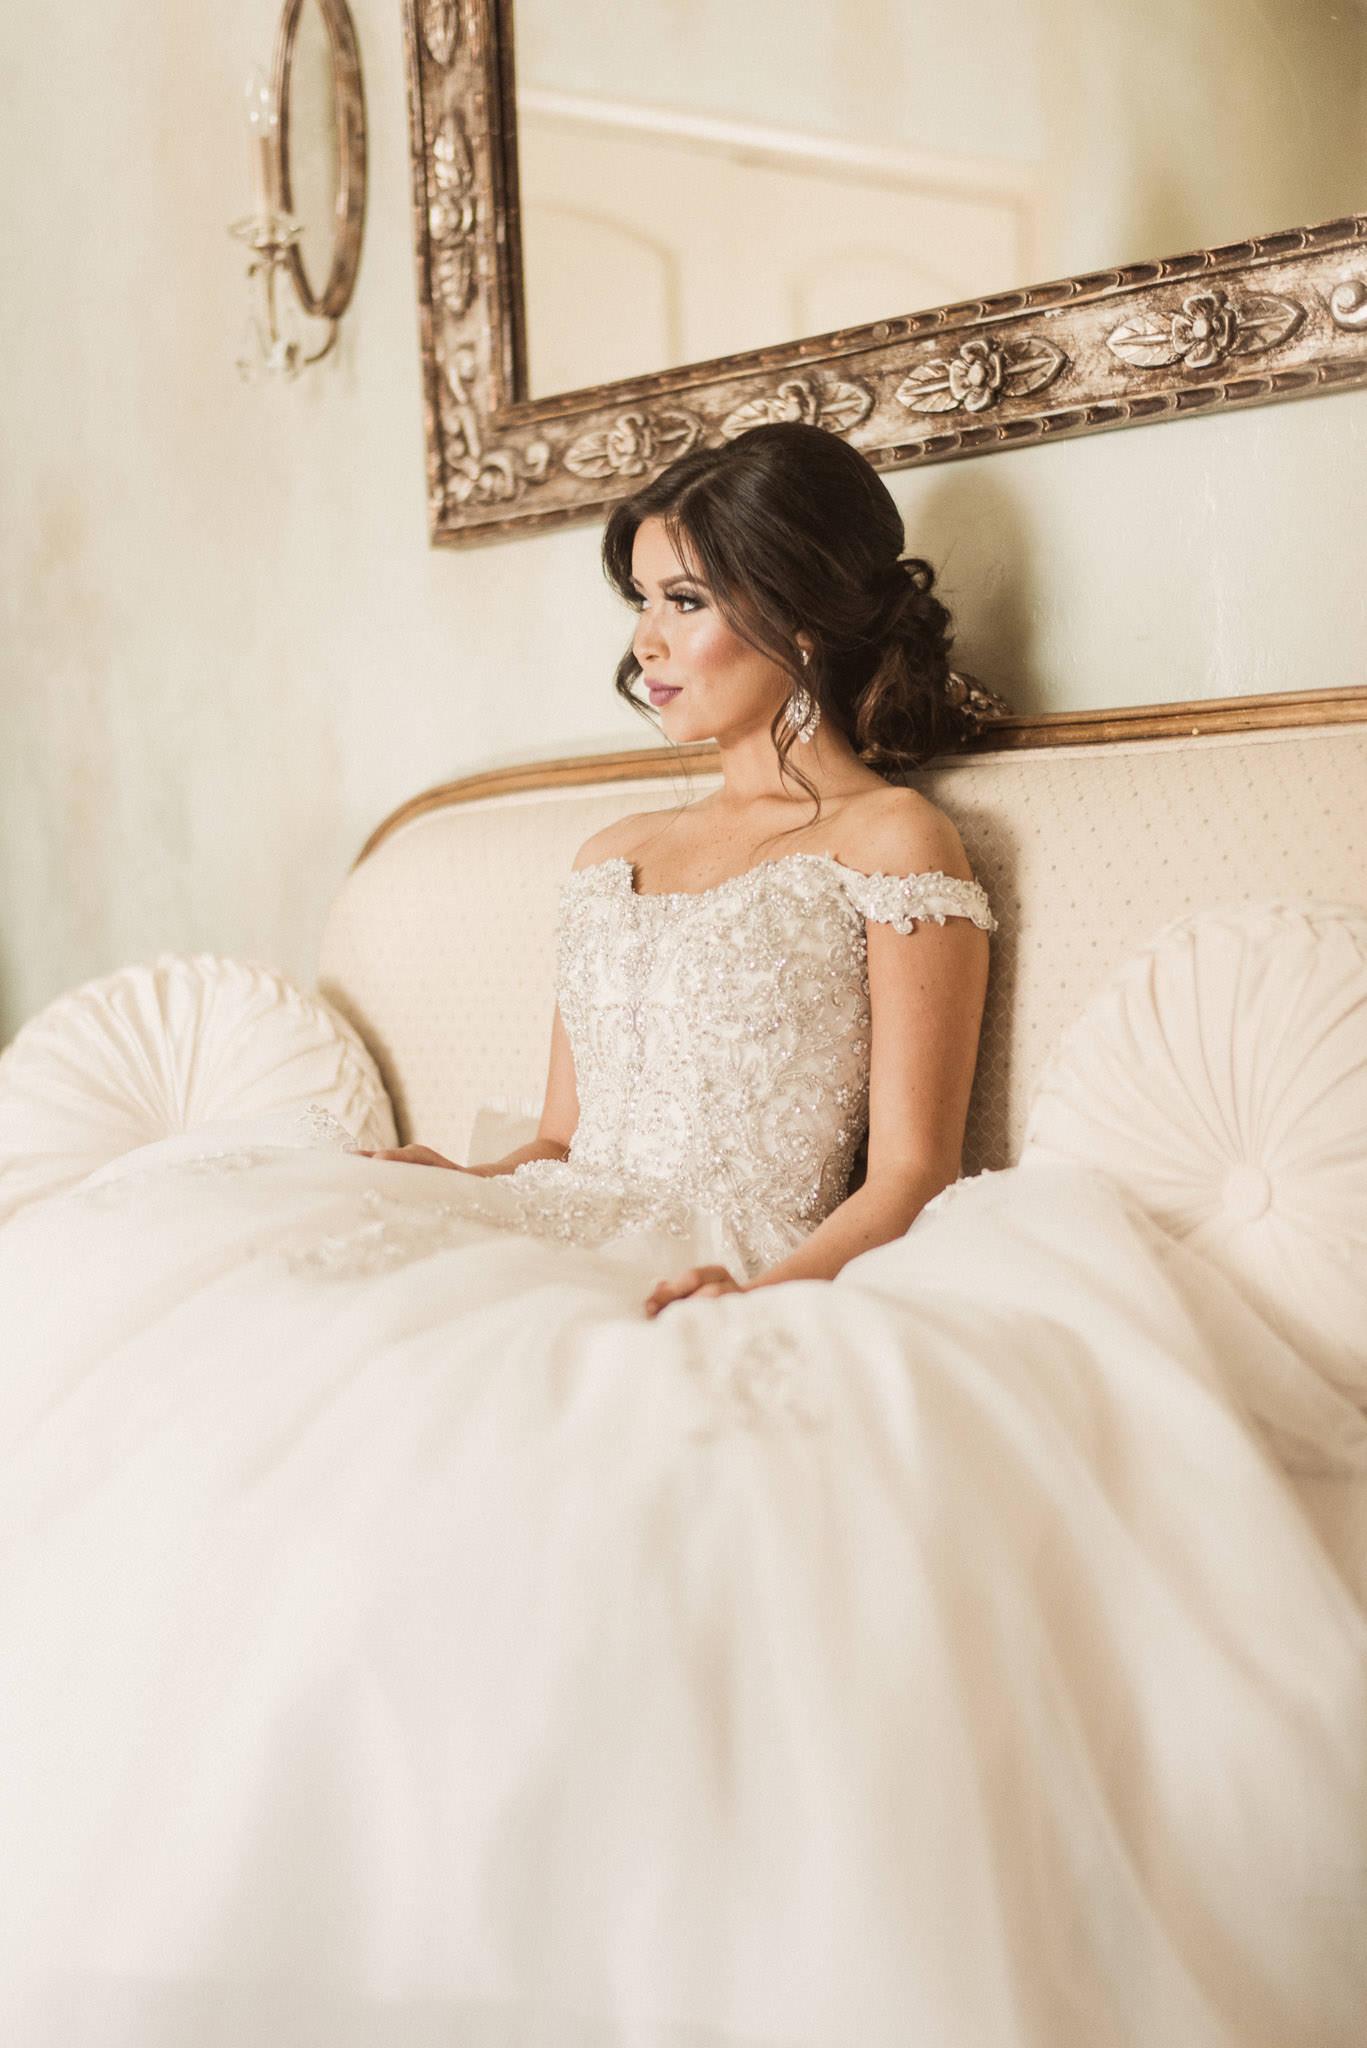 adriana-christian-wedding-re-sm-35.jpg